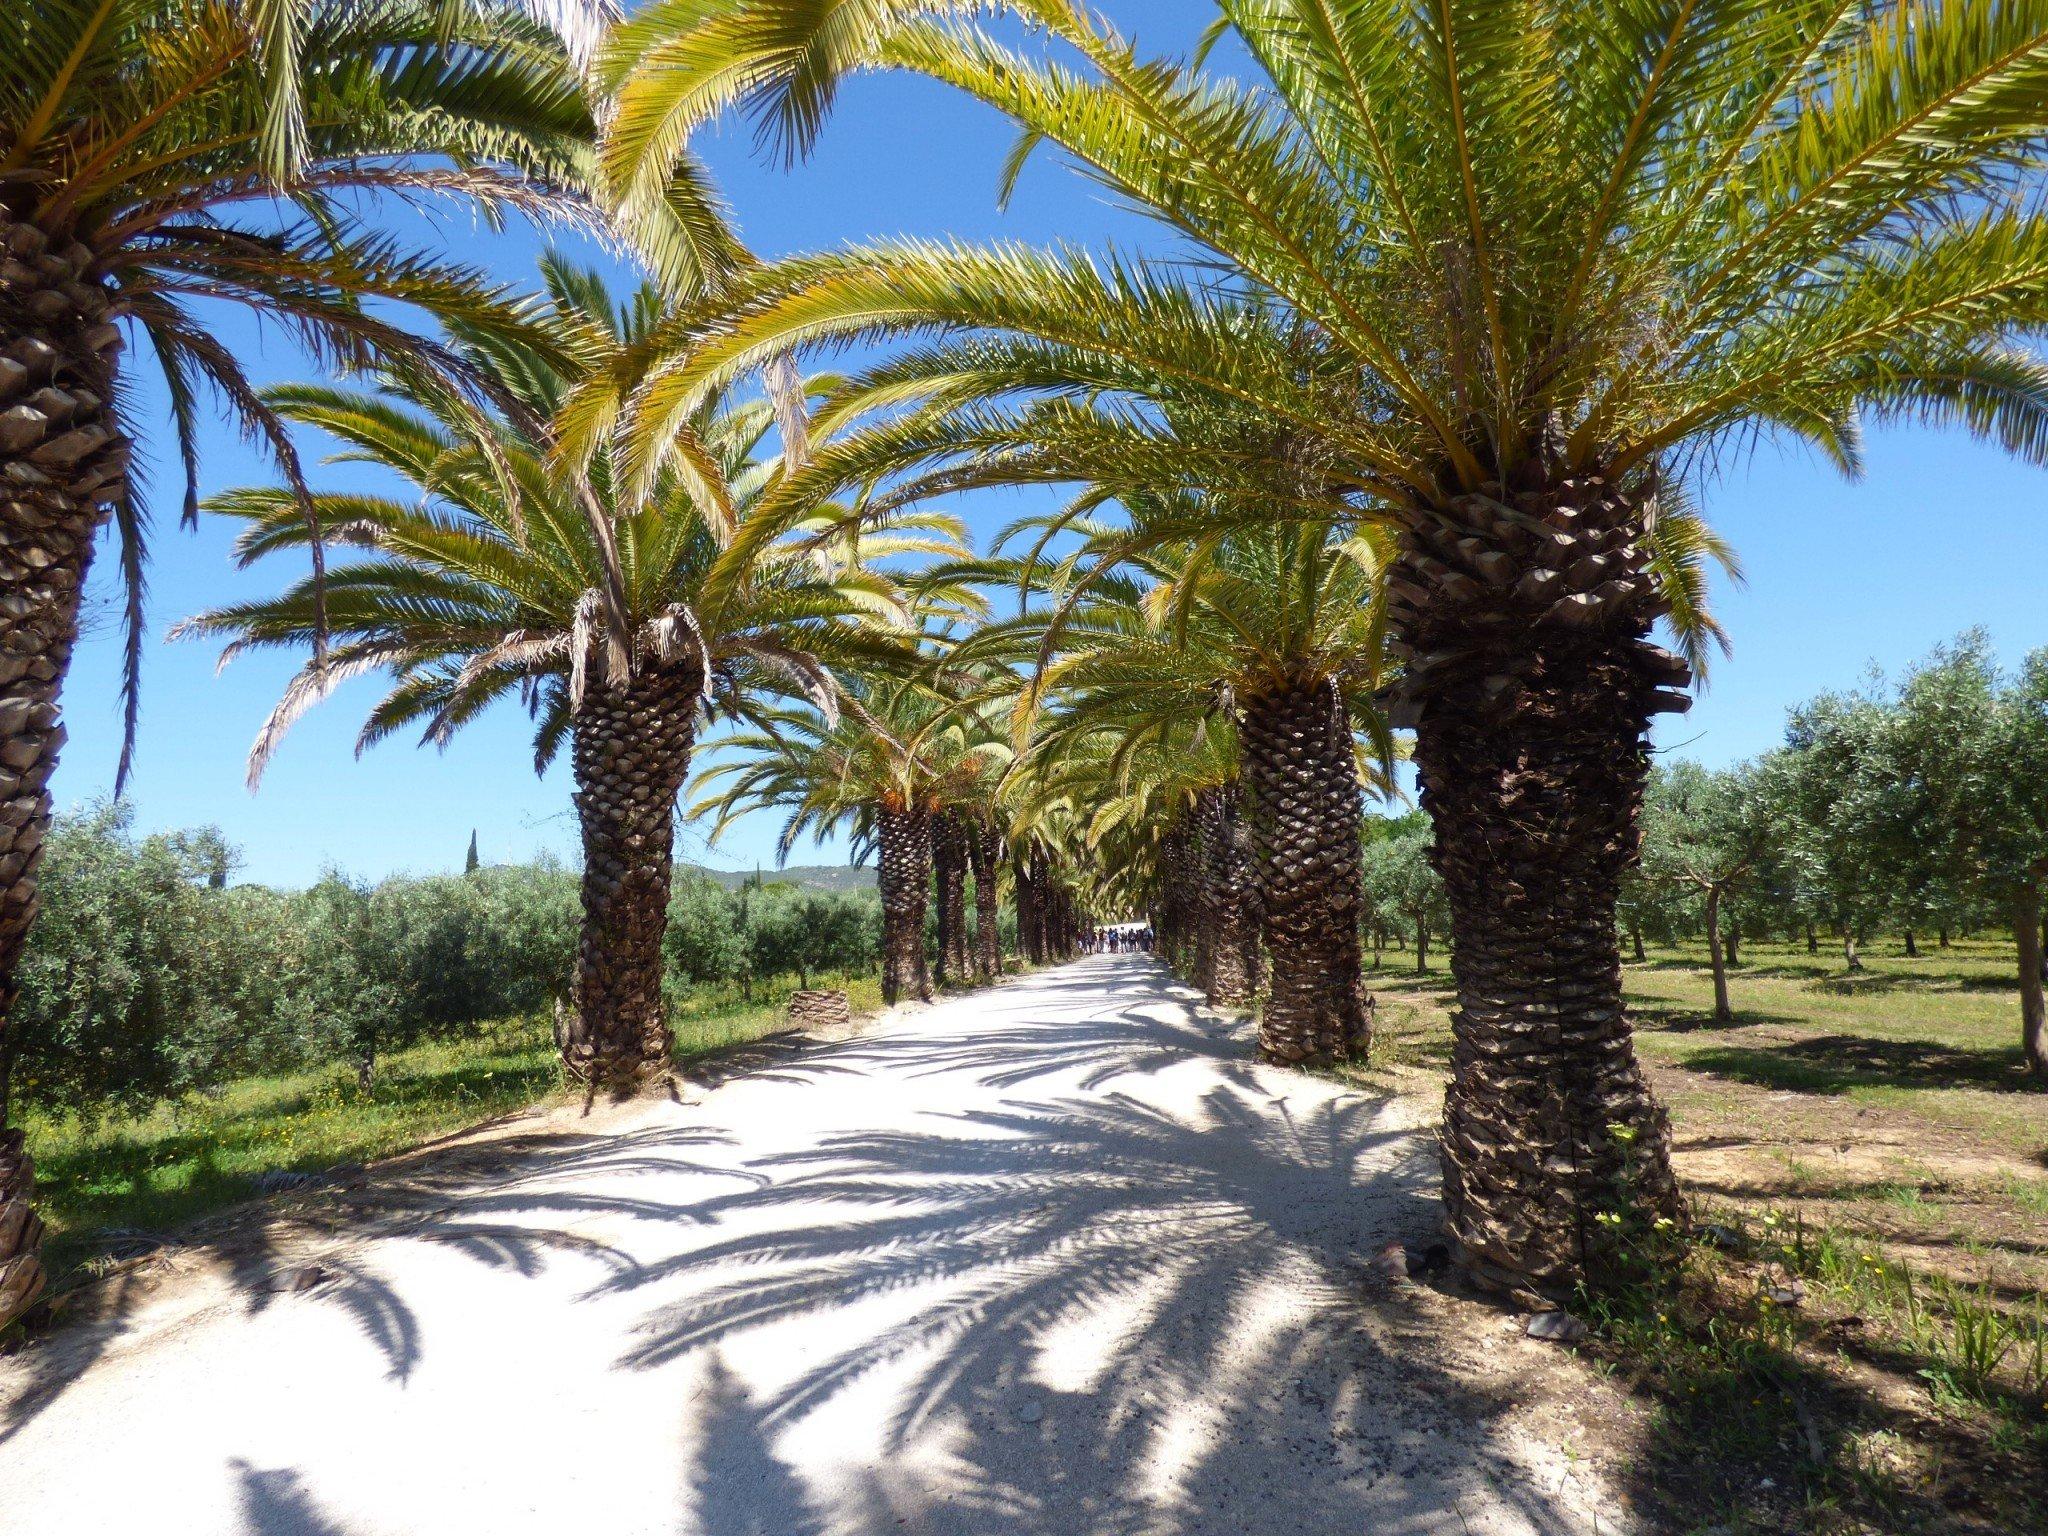 Algarve palmut